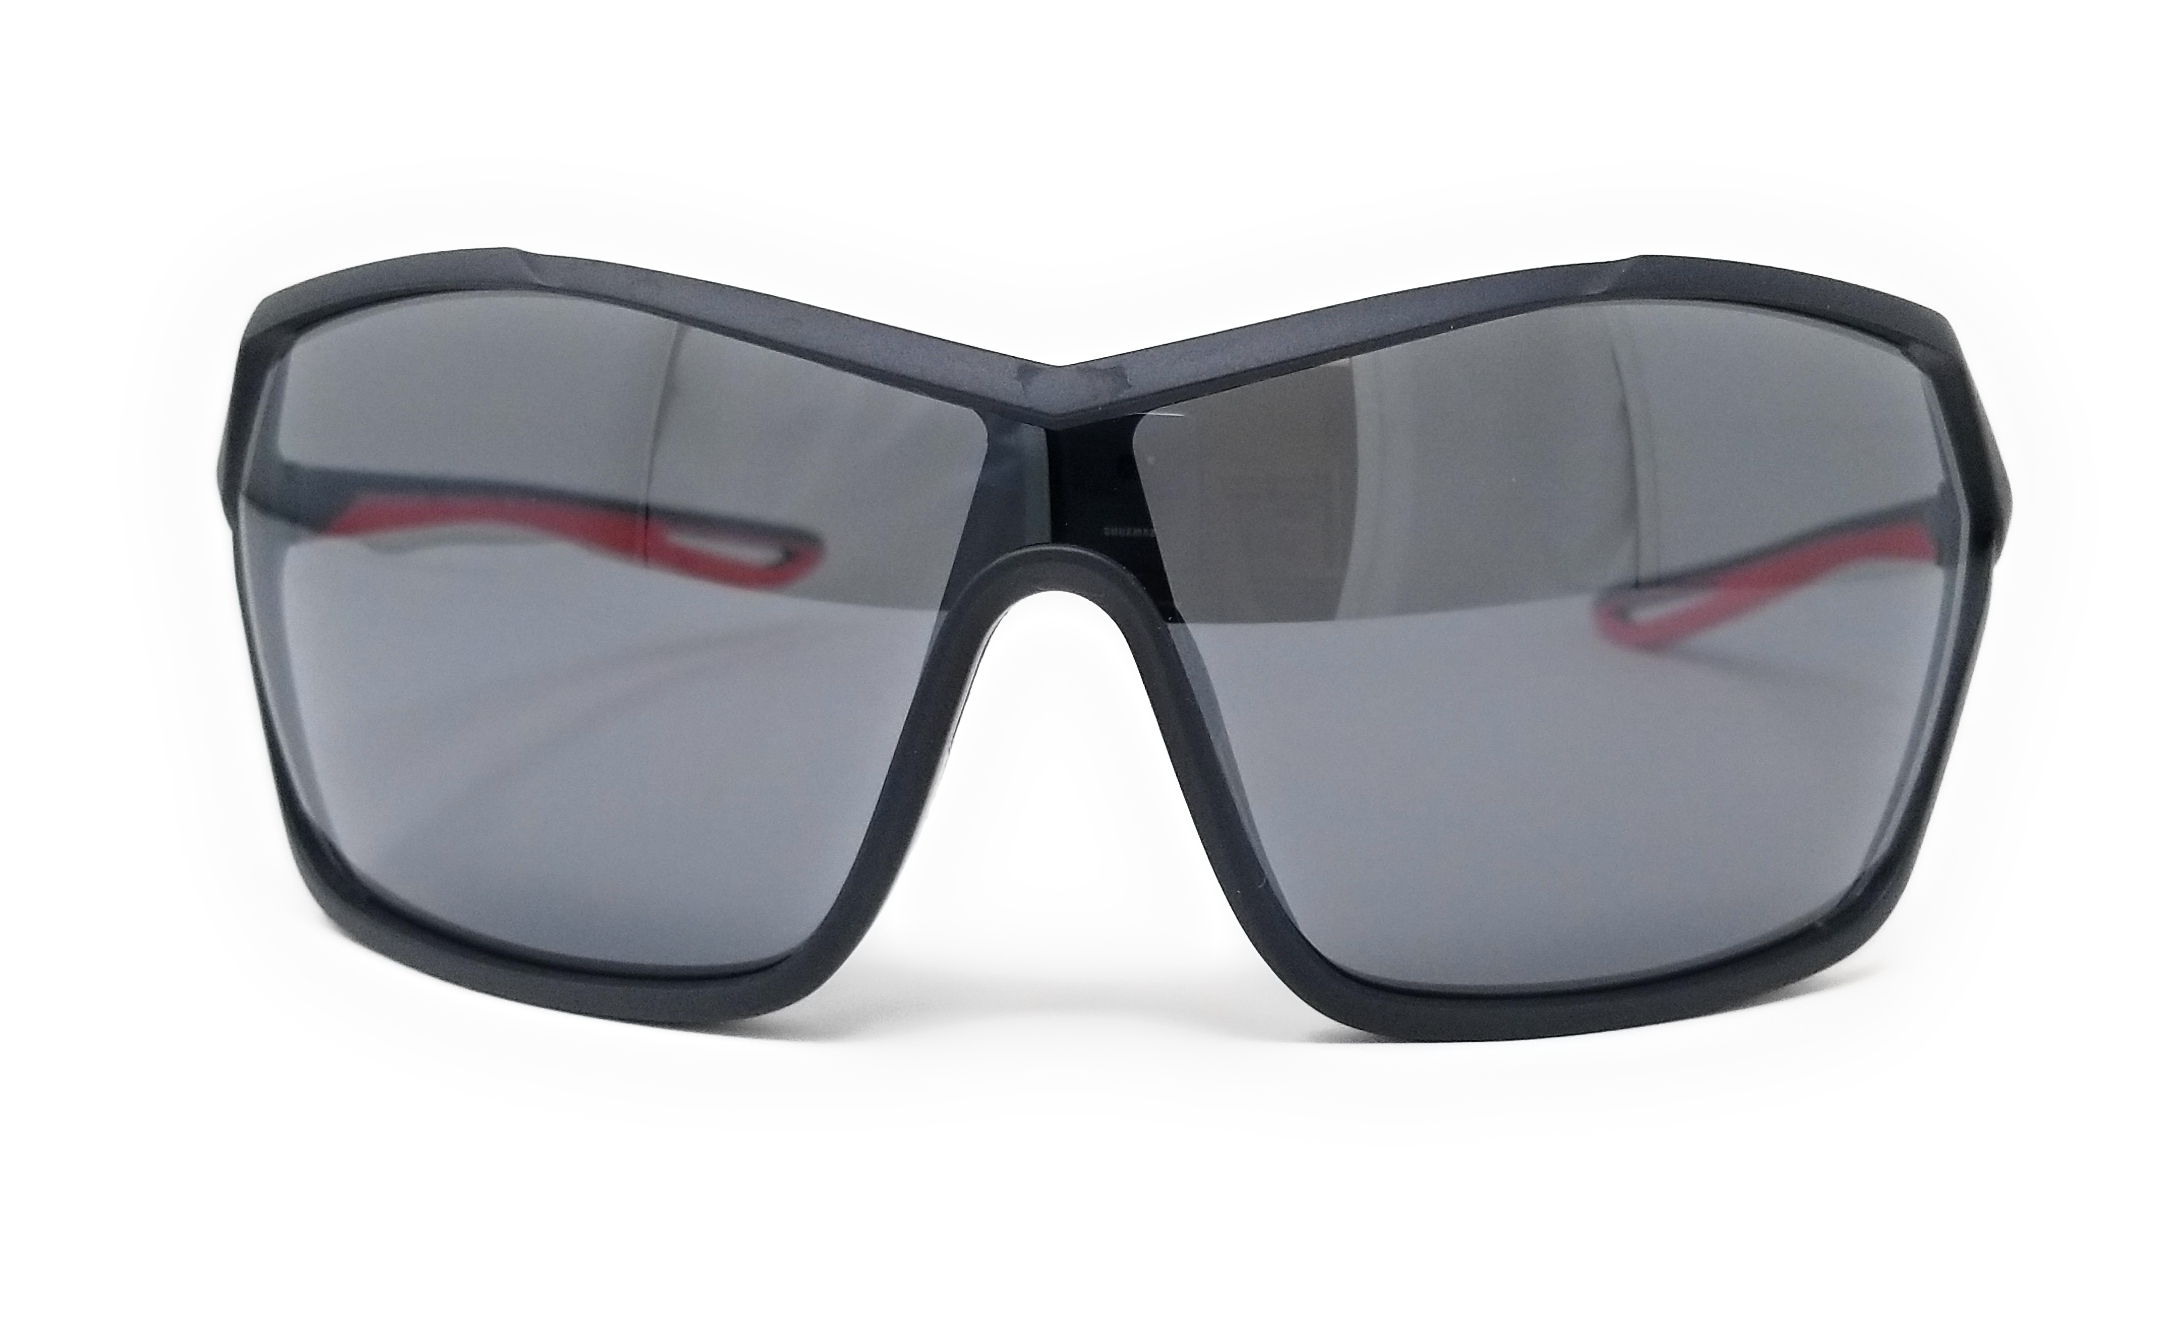 890b17da153 NIKE Sunglasses HELIX ELITE EV1036 010 Anthracite Shield 73x09x120 ...